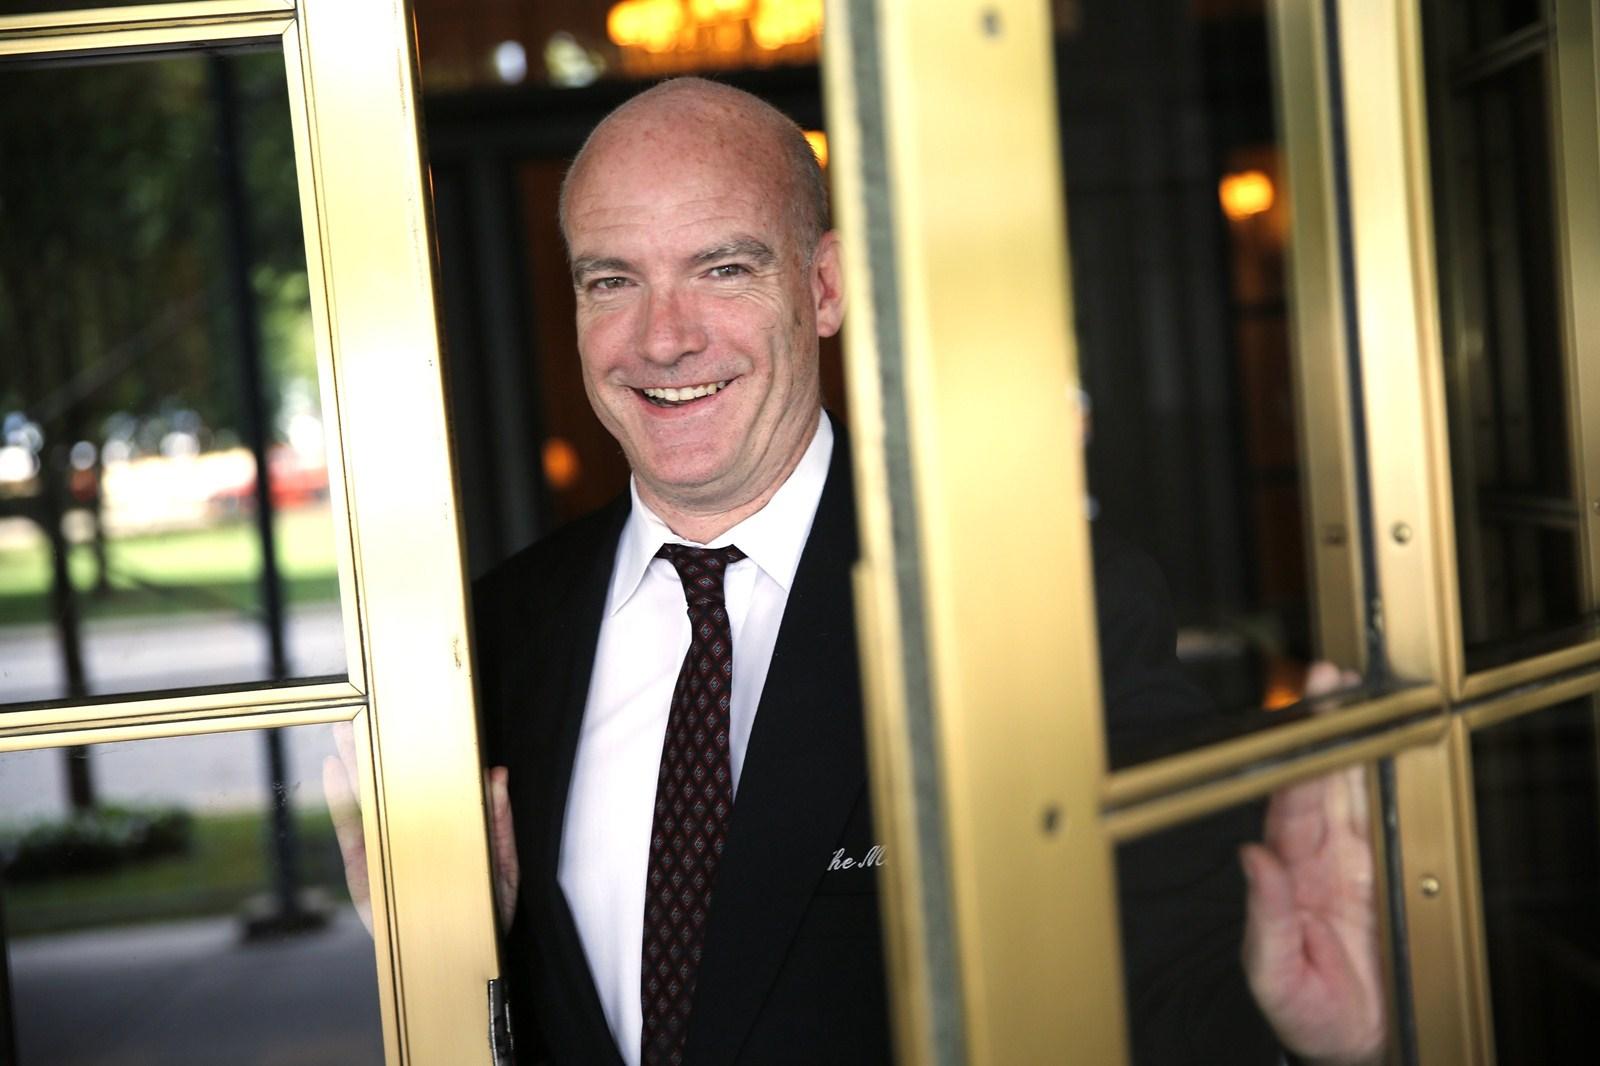 sc 1 st  Chicago Tribune & Chicago doormen ratify new contract with better benefits - West